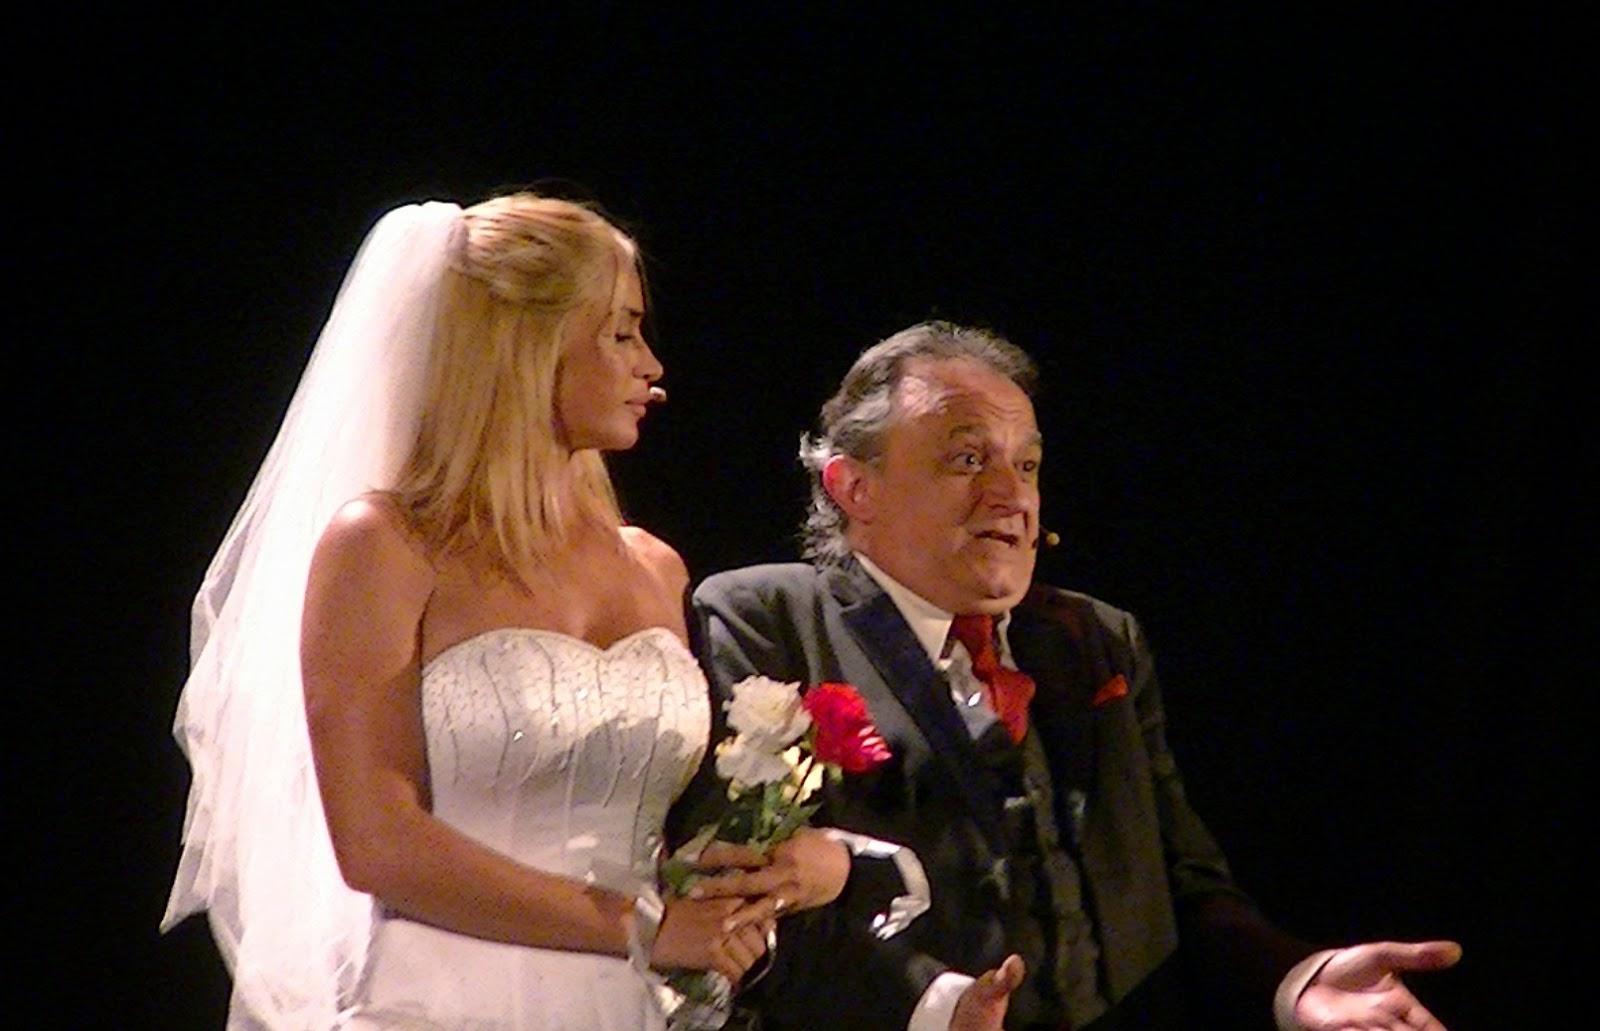 Matrimonio Por Conveniencia : La ley de herodes pan prd matrimonio por